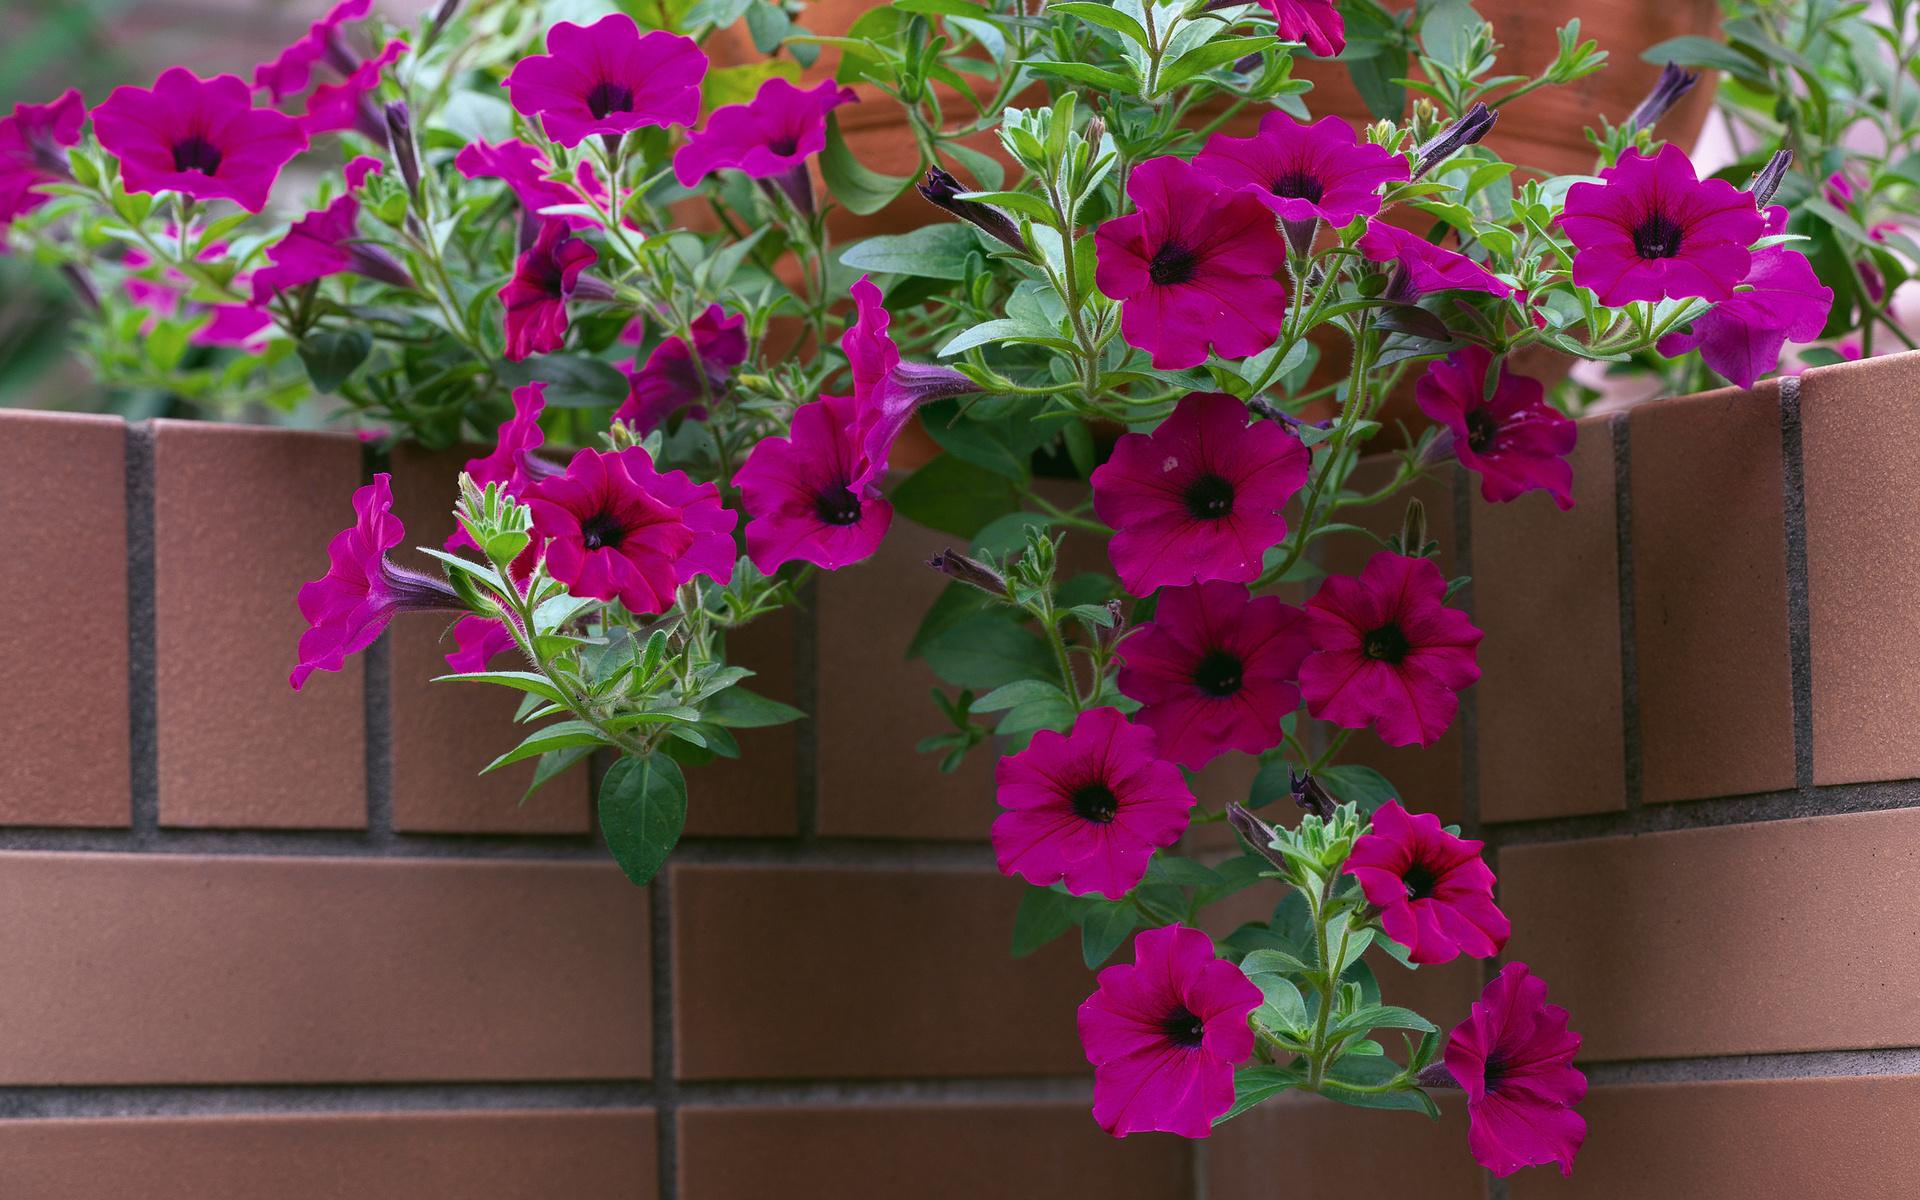 Beautiful flowers of petunia in the park wallpapers and images beautiful flowers of petunia in the park wallpapers and images wallpapers pictures photos izmirmasajfo